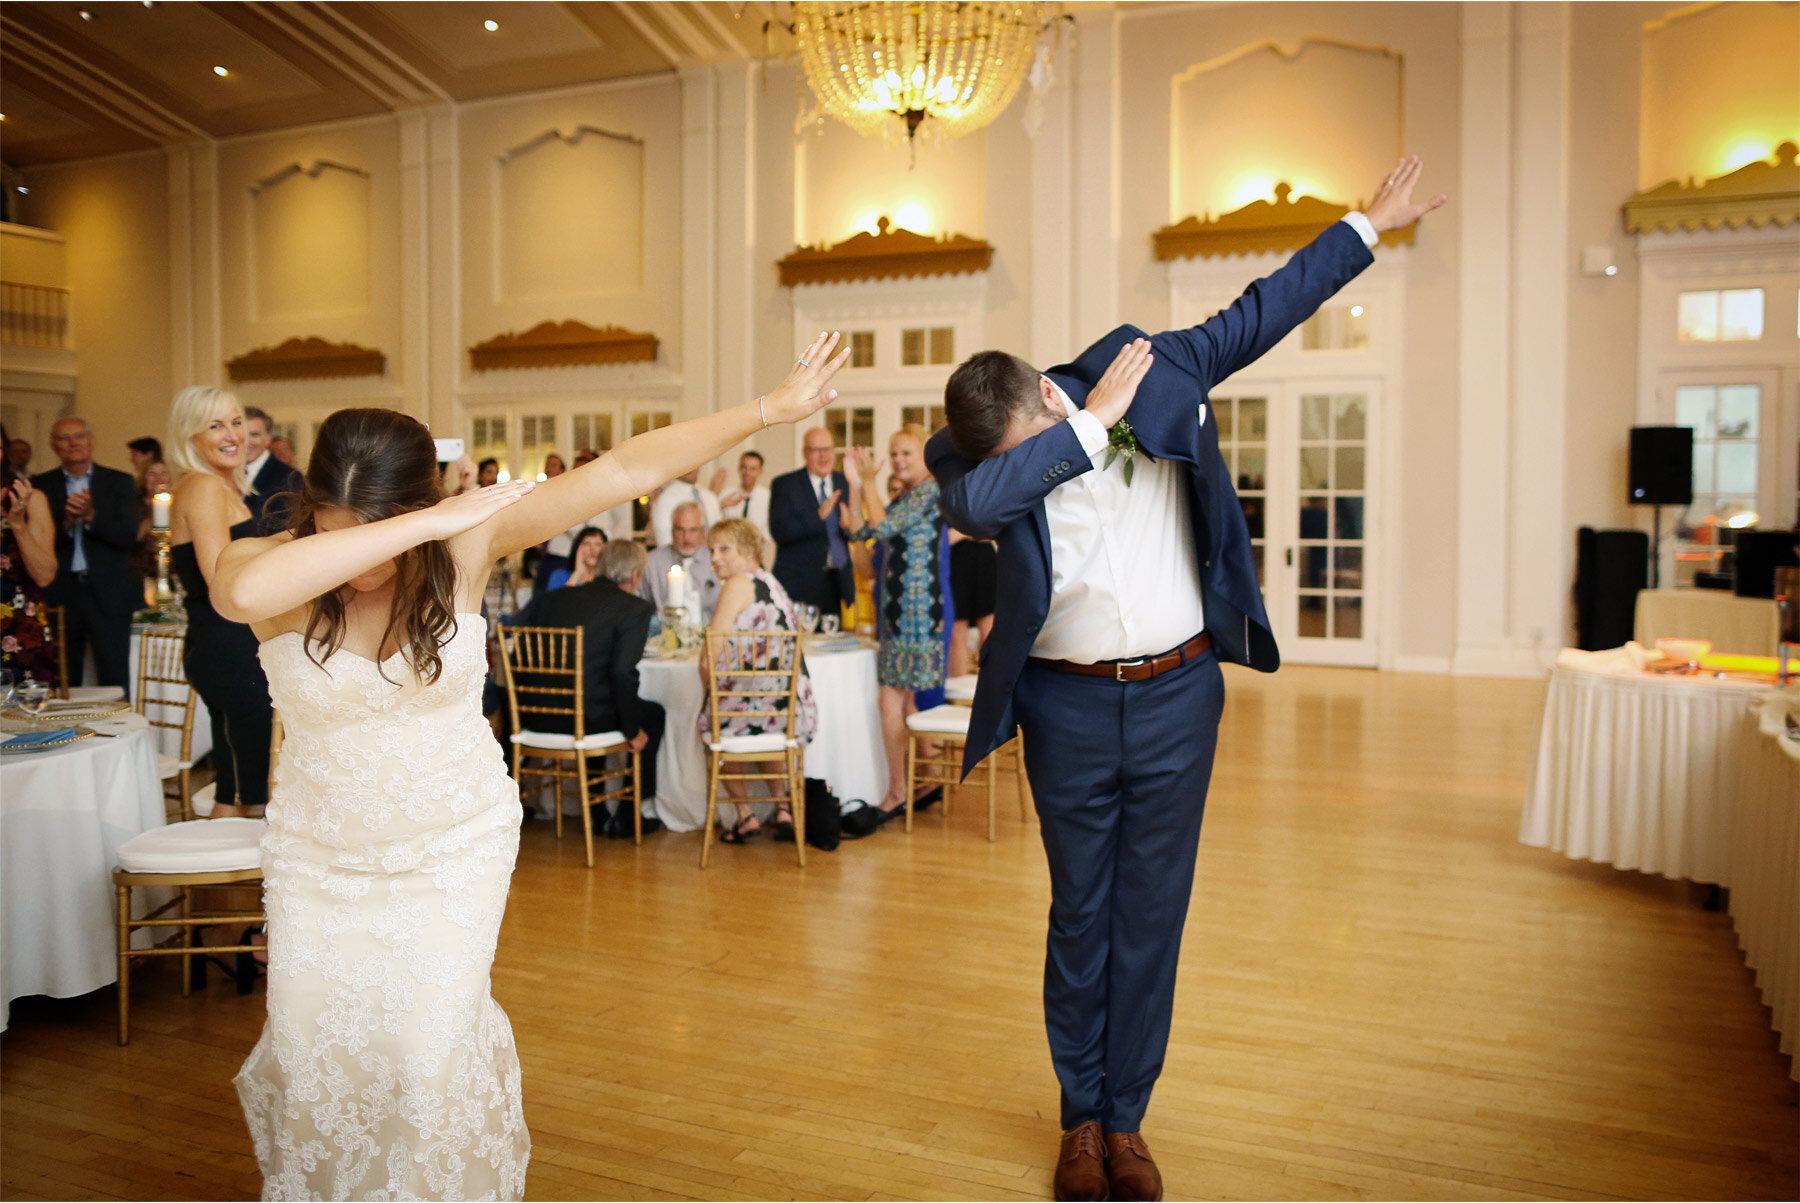 16-Vick-Photography-Wedding-Minnetonka-Minnesota-Lafayette-Club-Reception-Dab-Bride-Groom-Katie-and-David.jpg